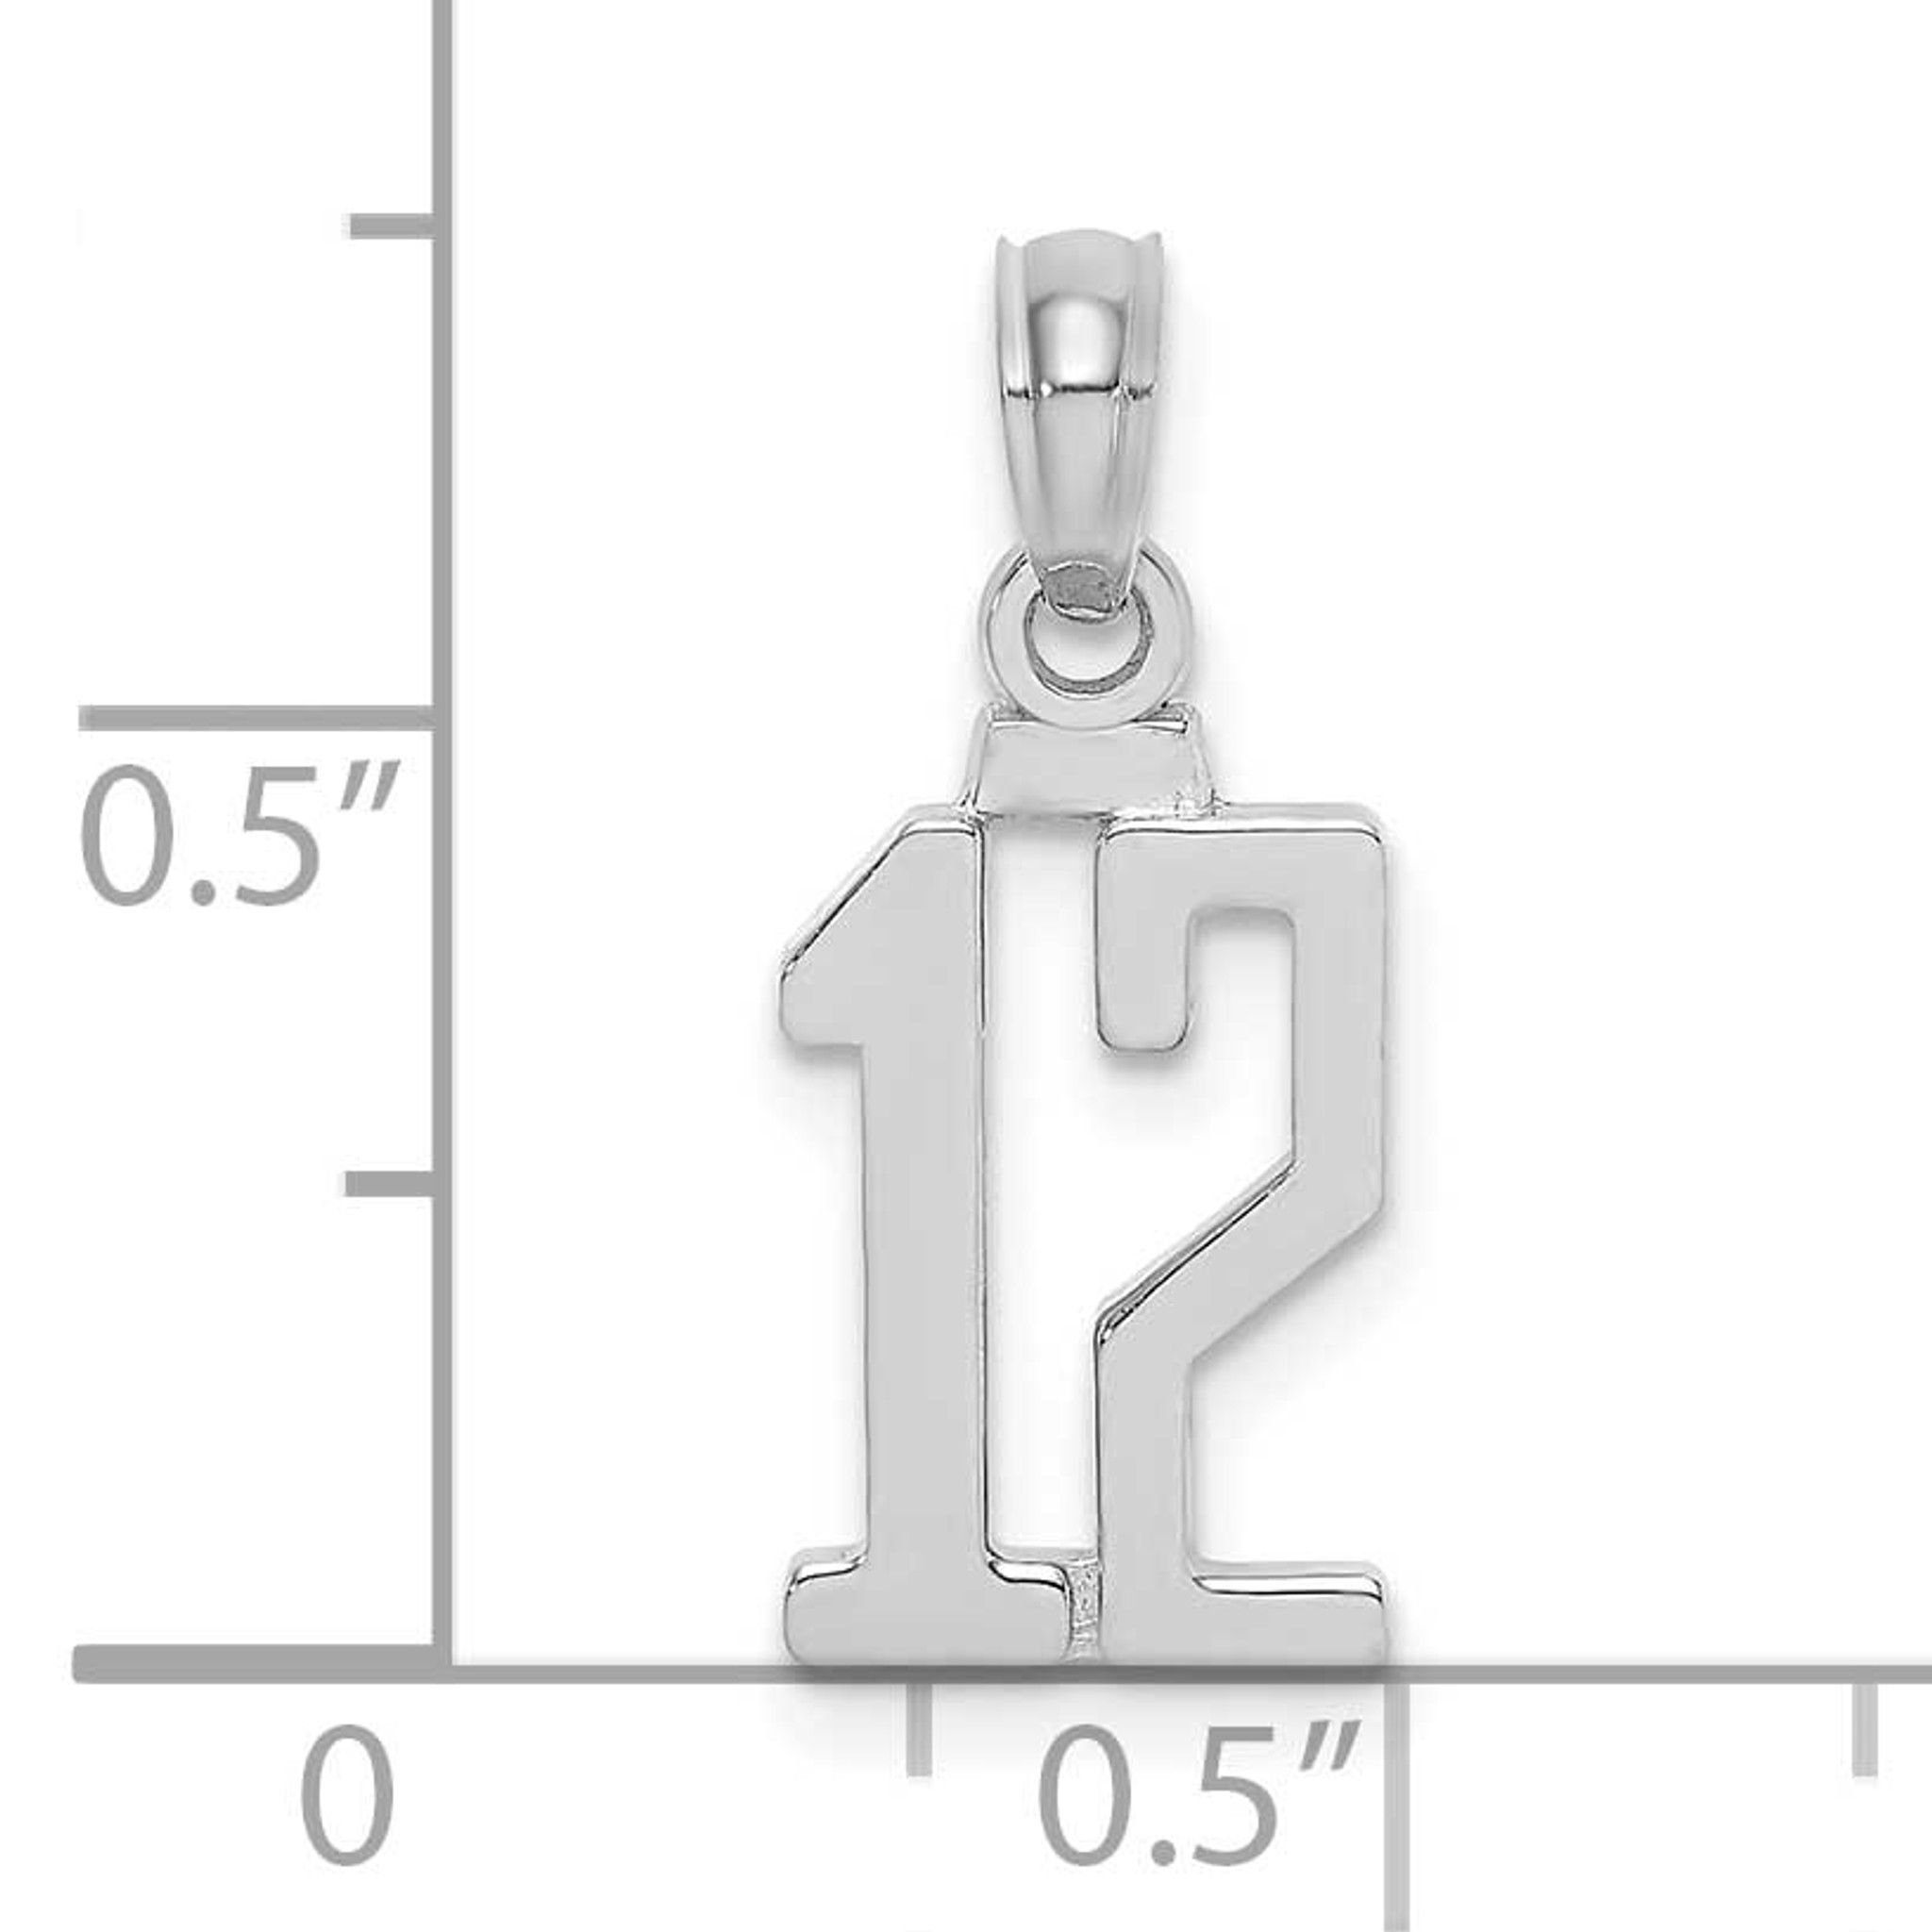 14K White Gold Polished Block Style Number 1 Charm Pendant